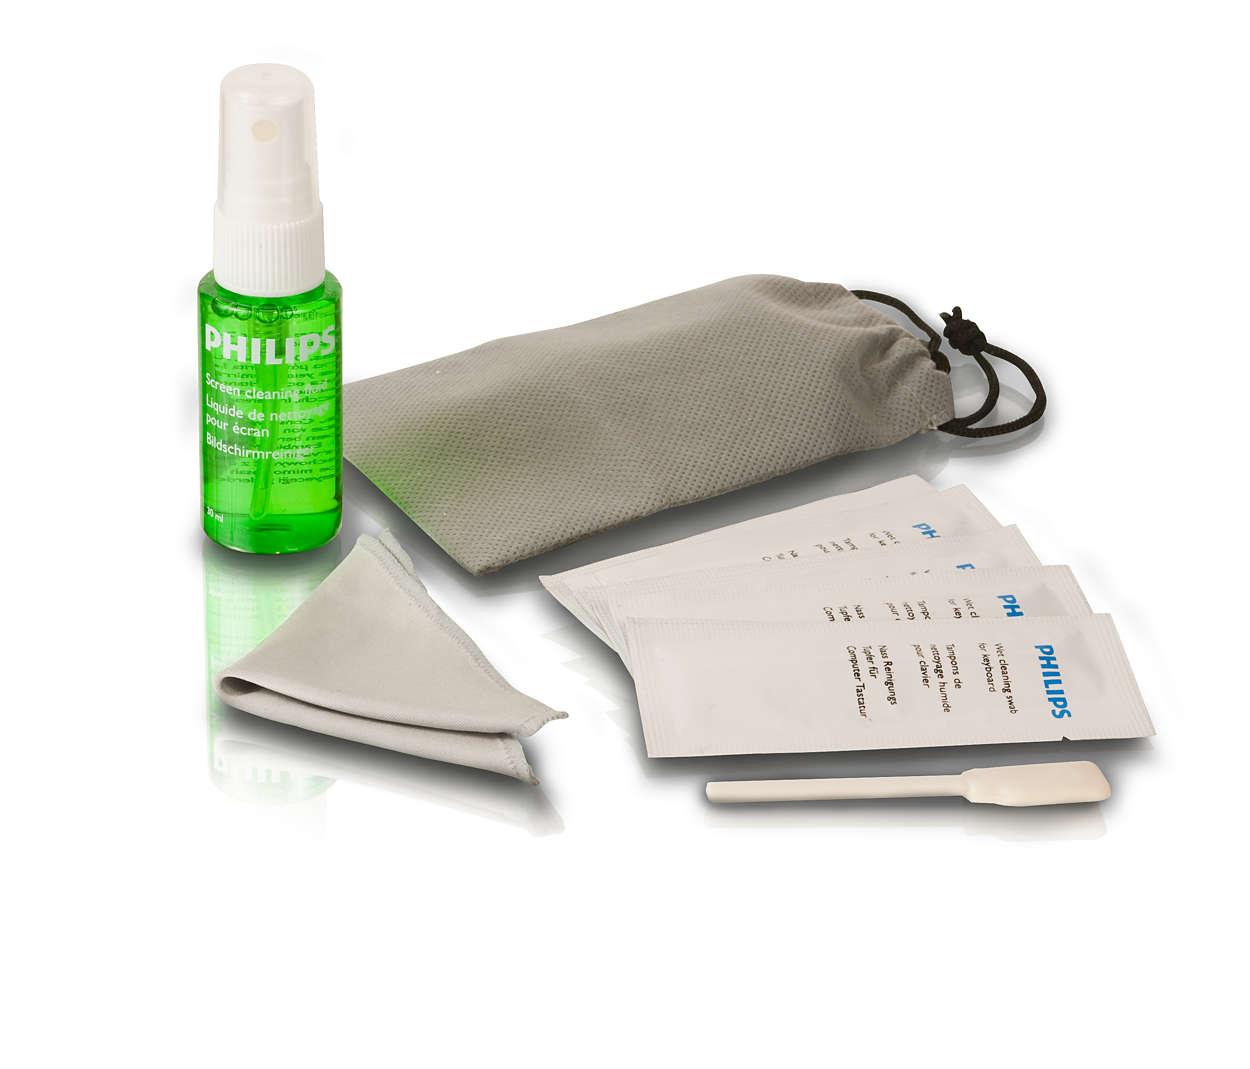 Kit de limpieza para pantallas